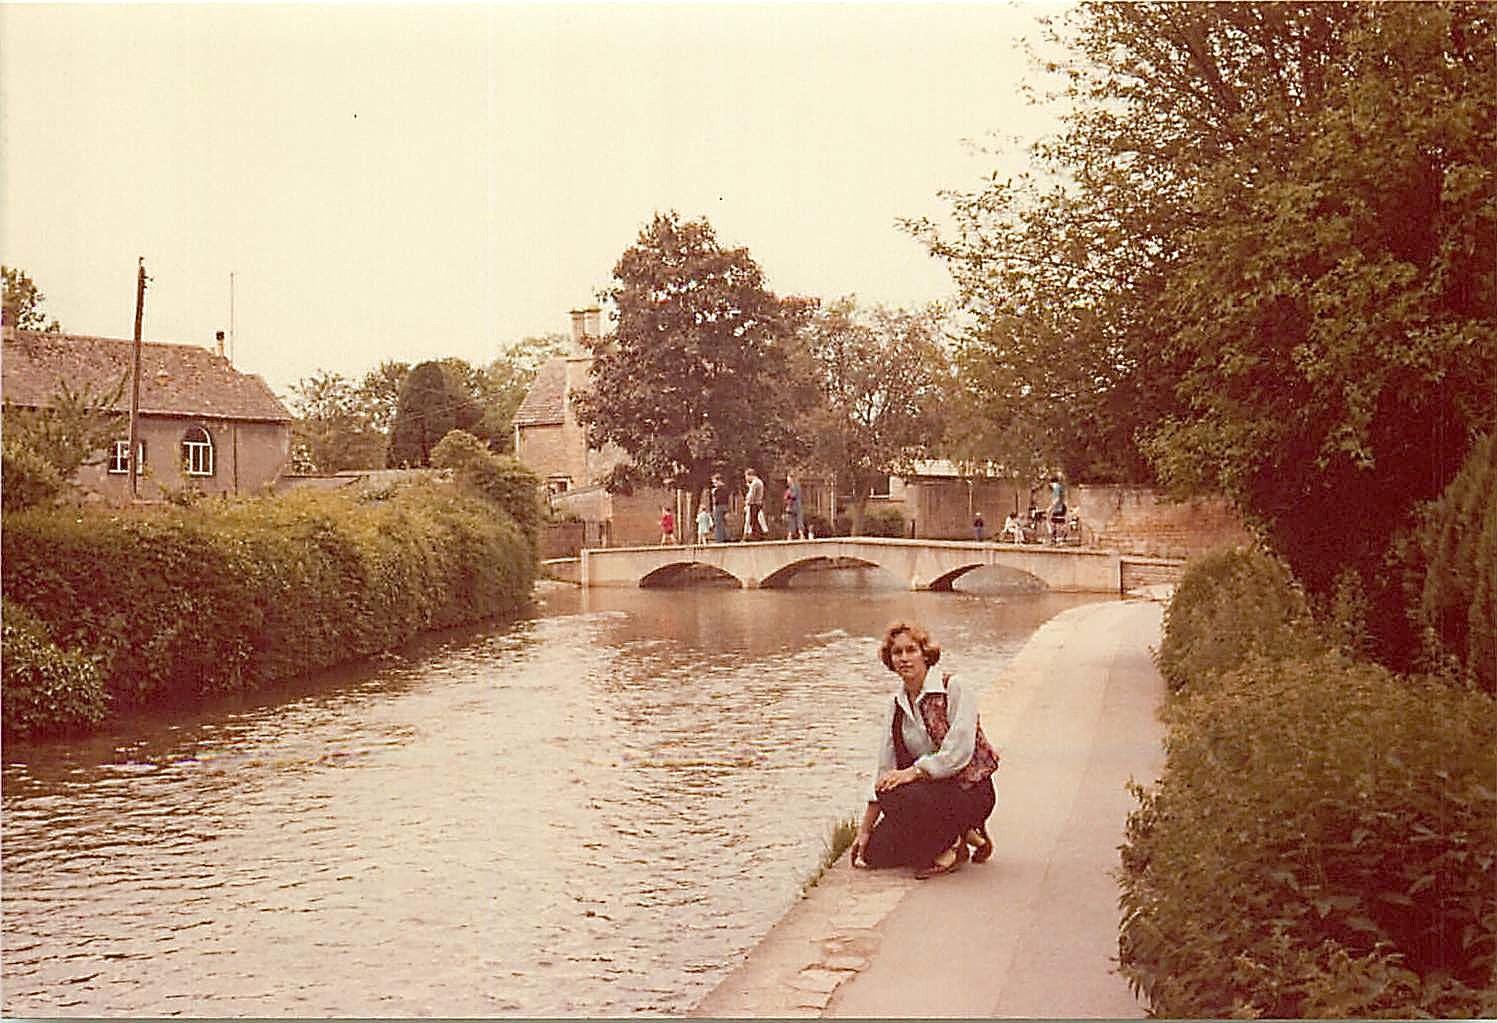 Lorraine Gudas, 1979, Cotswolds, England